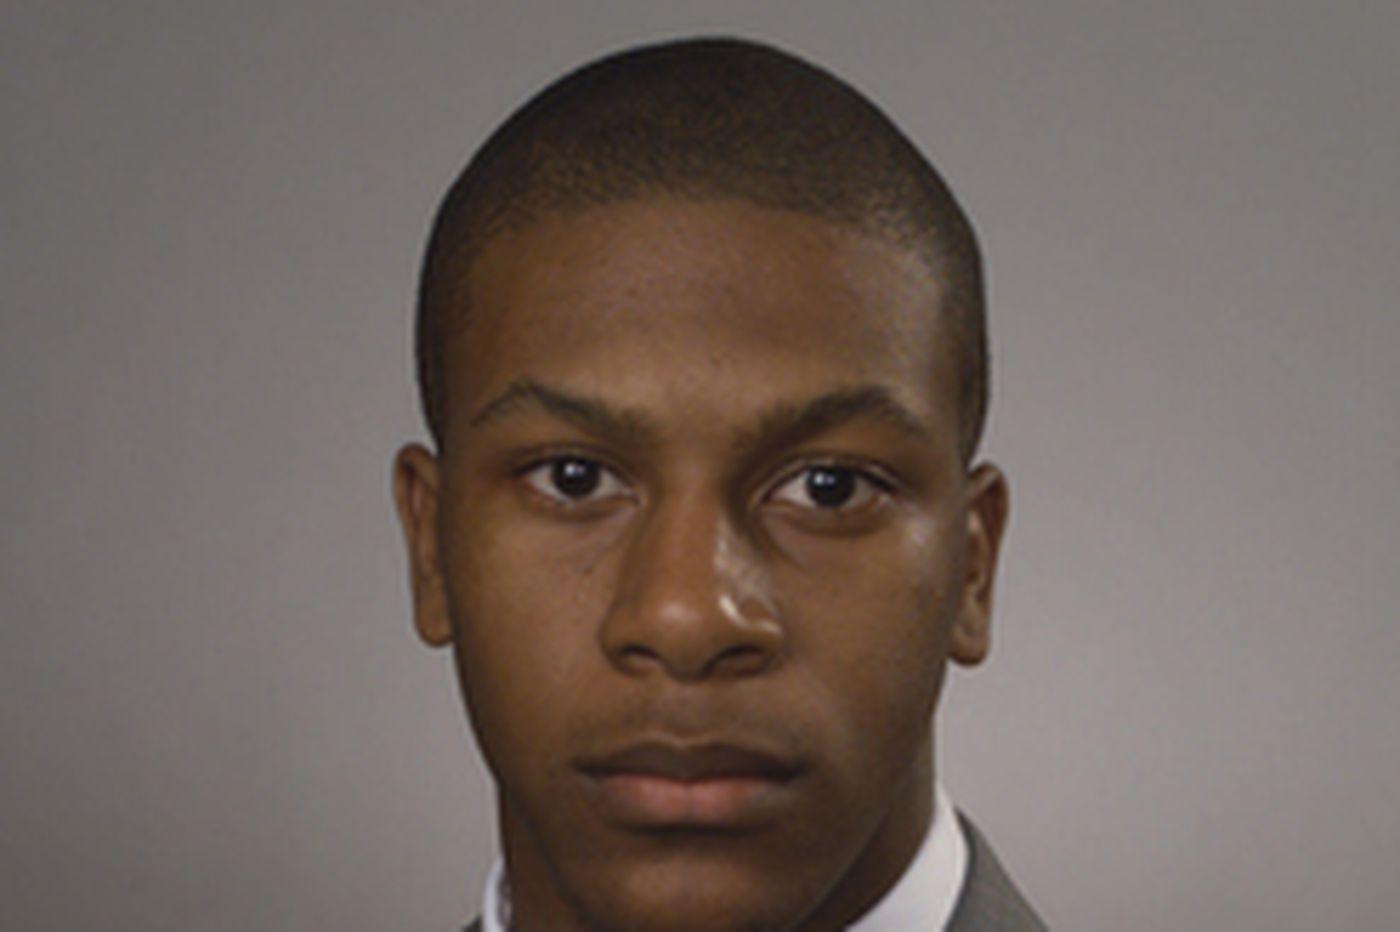 Penn State wide receiver Butler spent summer on crime scenes